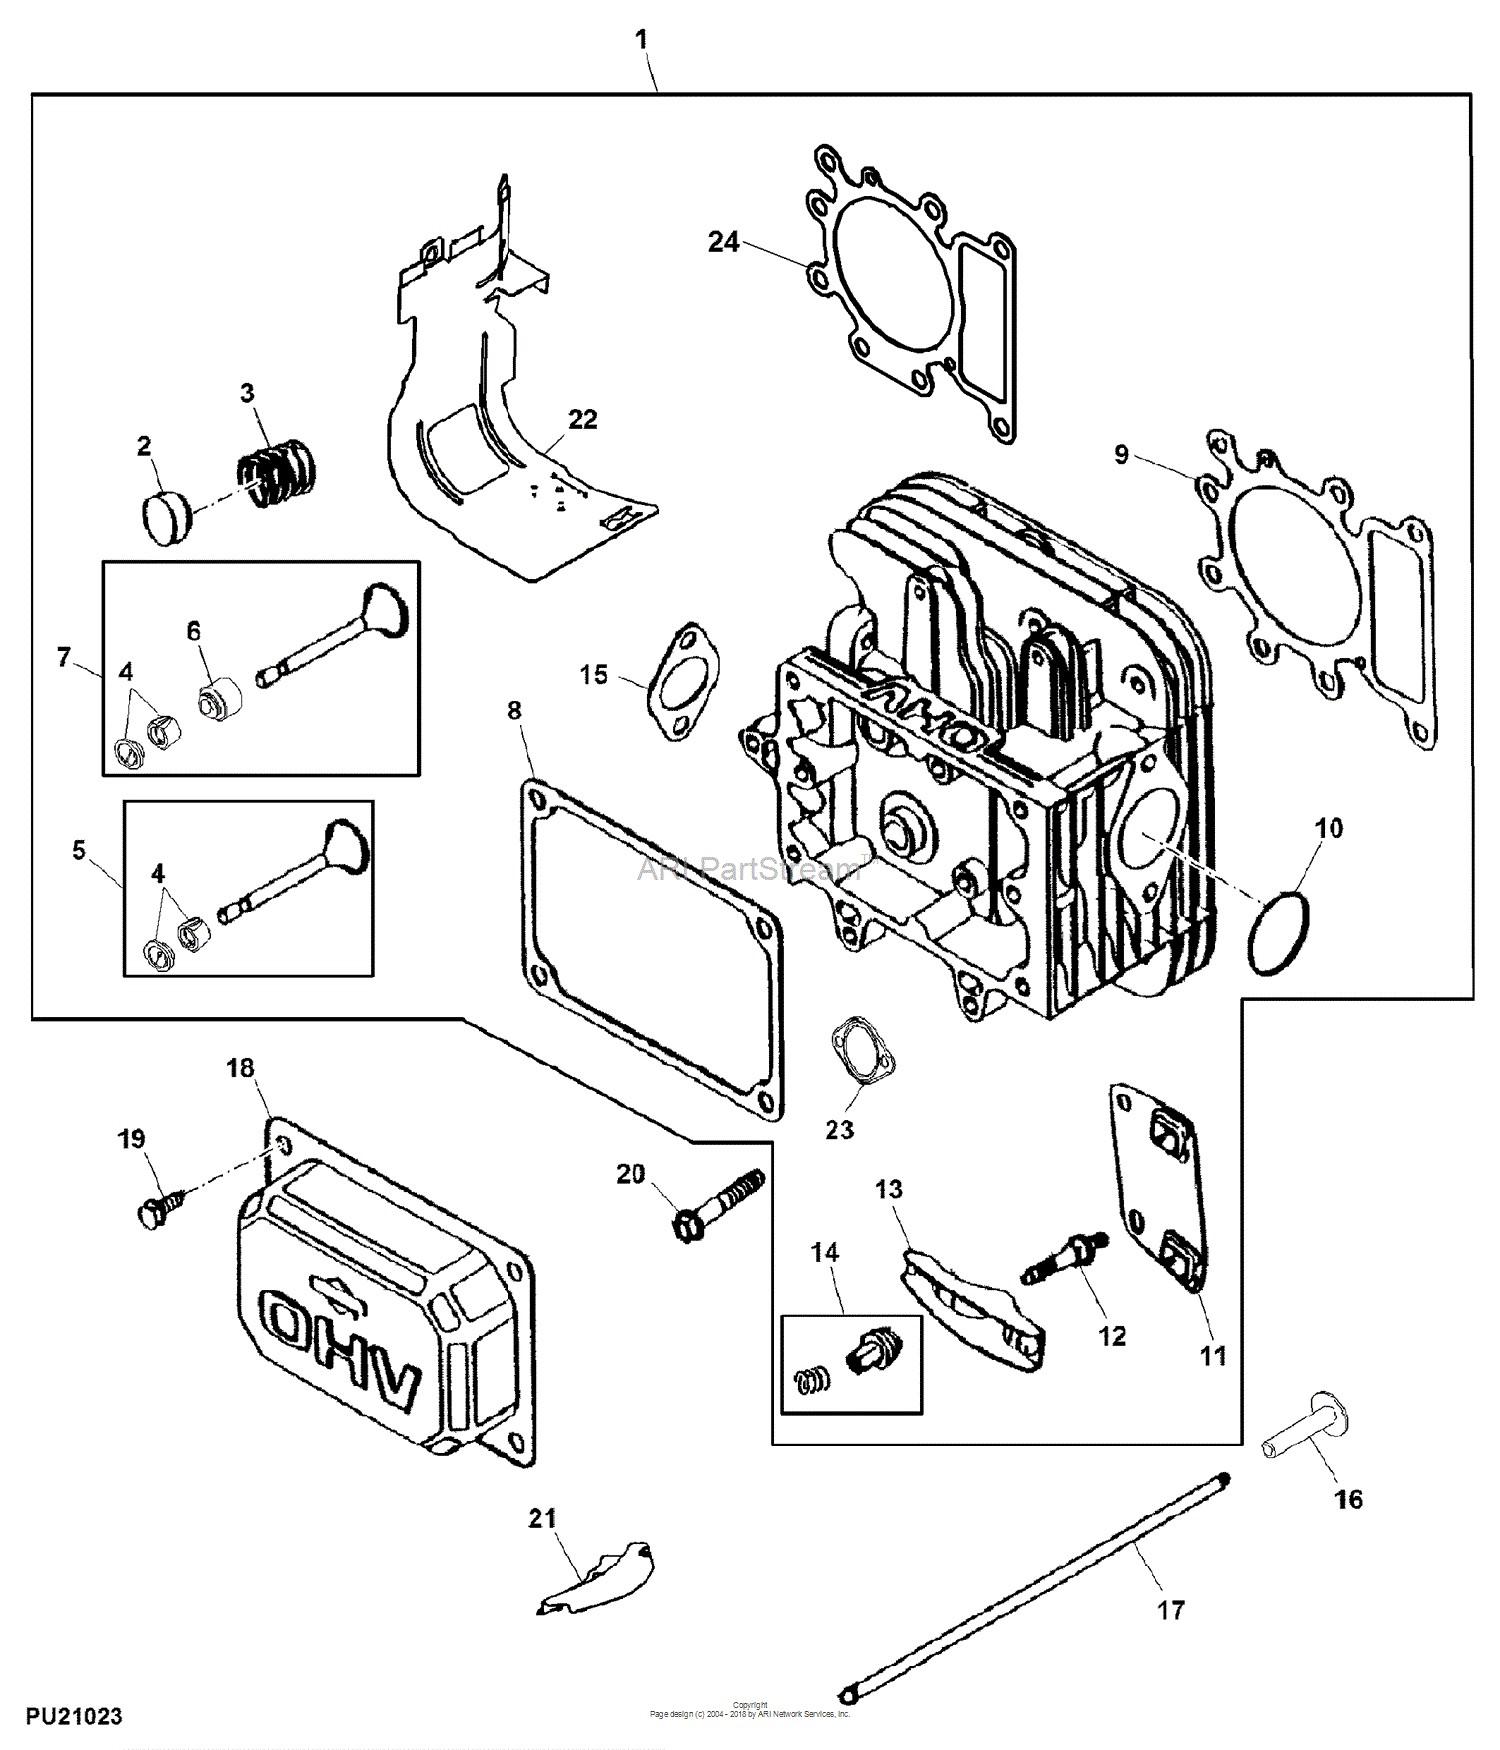 3910c7 john deere d105 wiring diagram | wiring resources  wiring resources